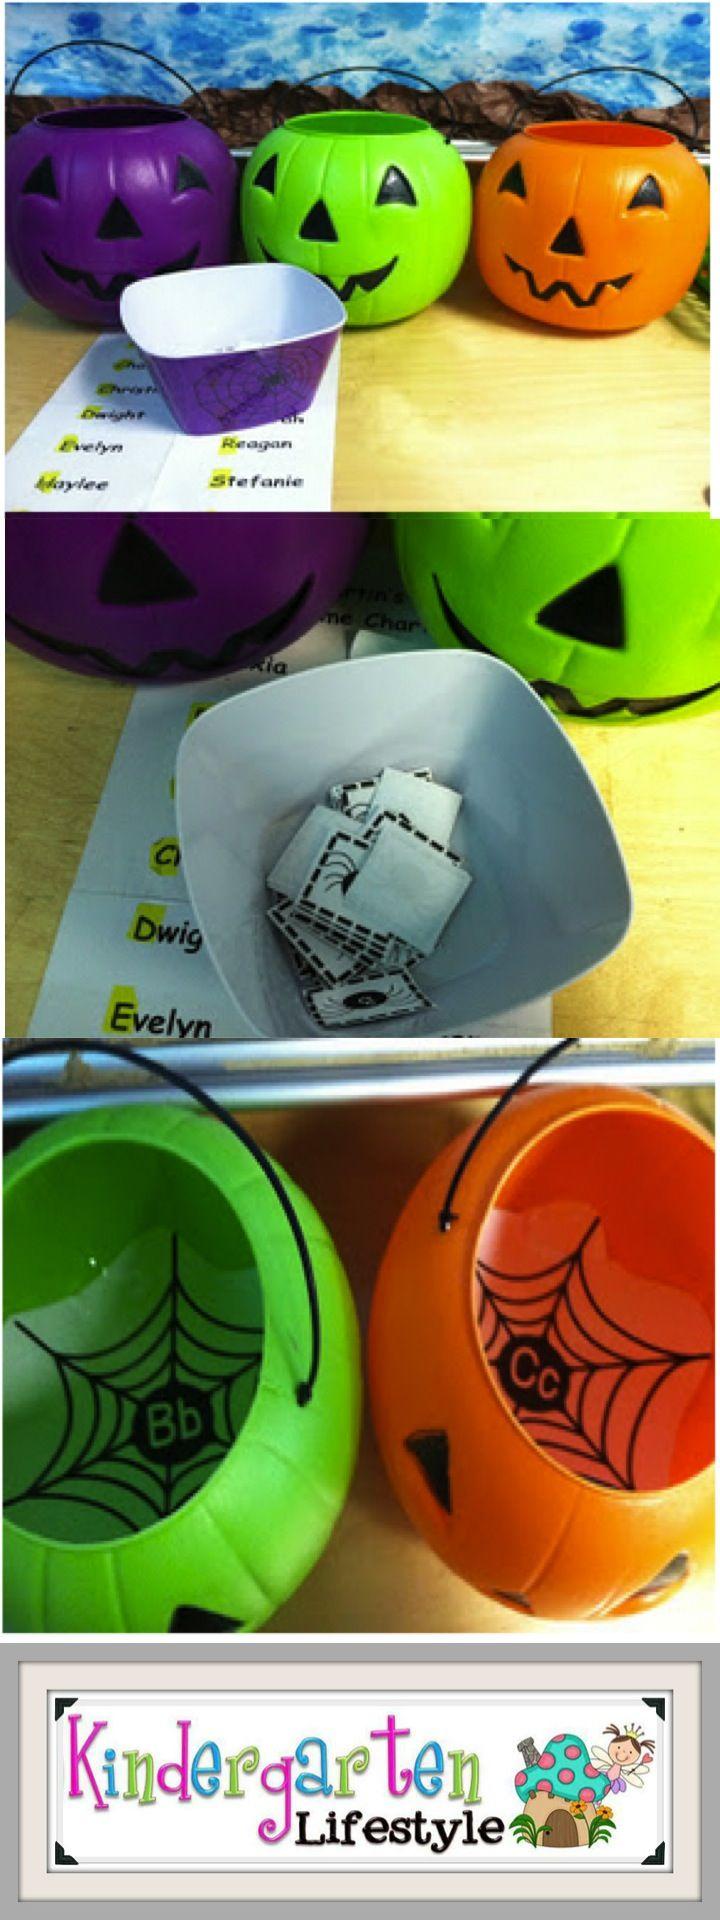 A Kindergarten Lifestyle - Spidery letter font sorting for kindergarten....